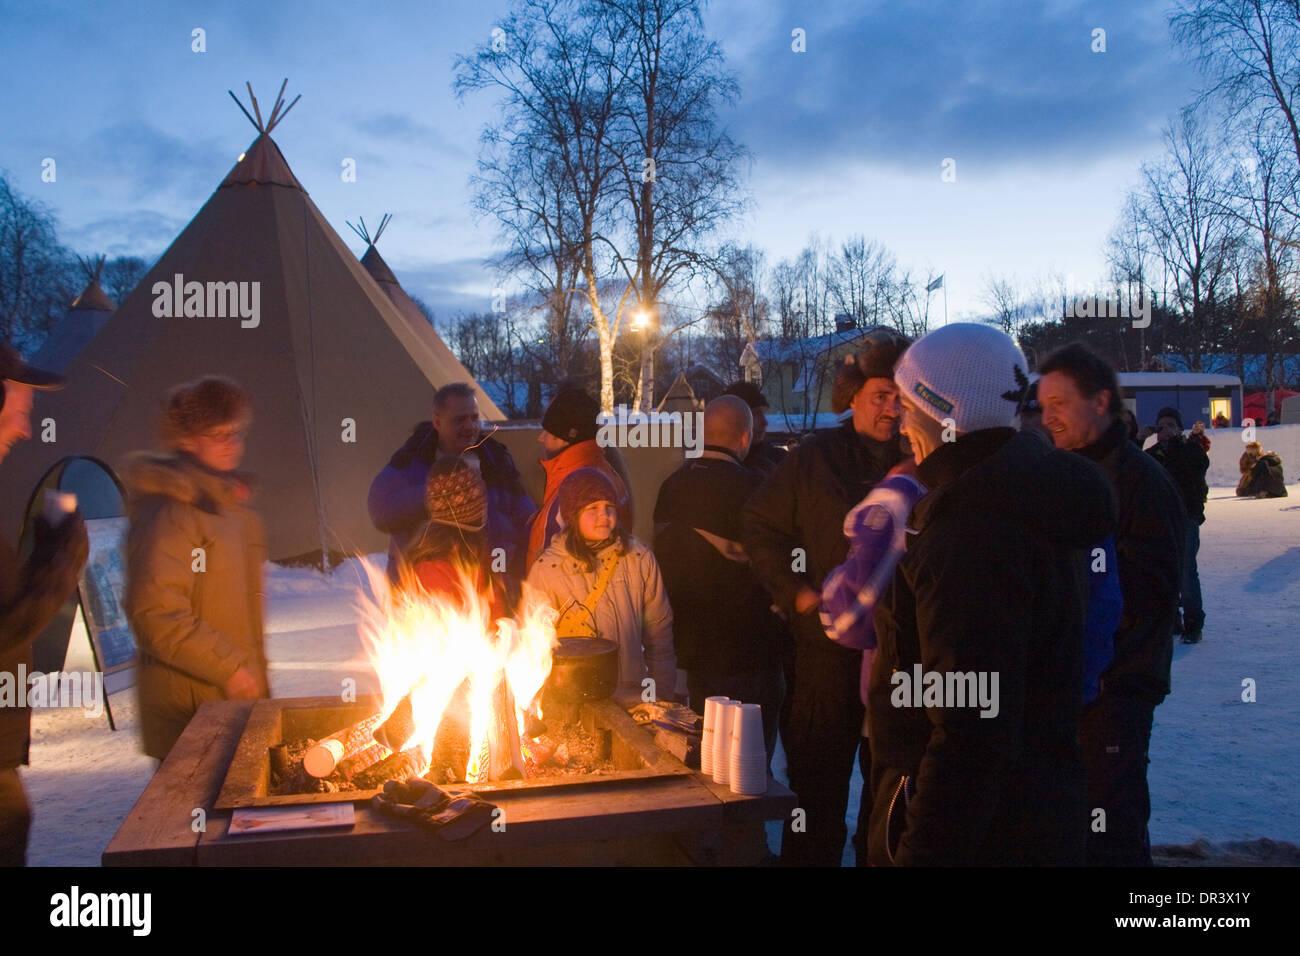 Cot-tent Jokkmokk fair Laponia Sweden Winter - Stock Image